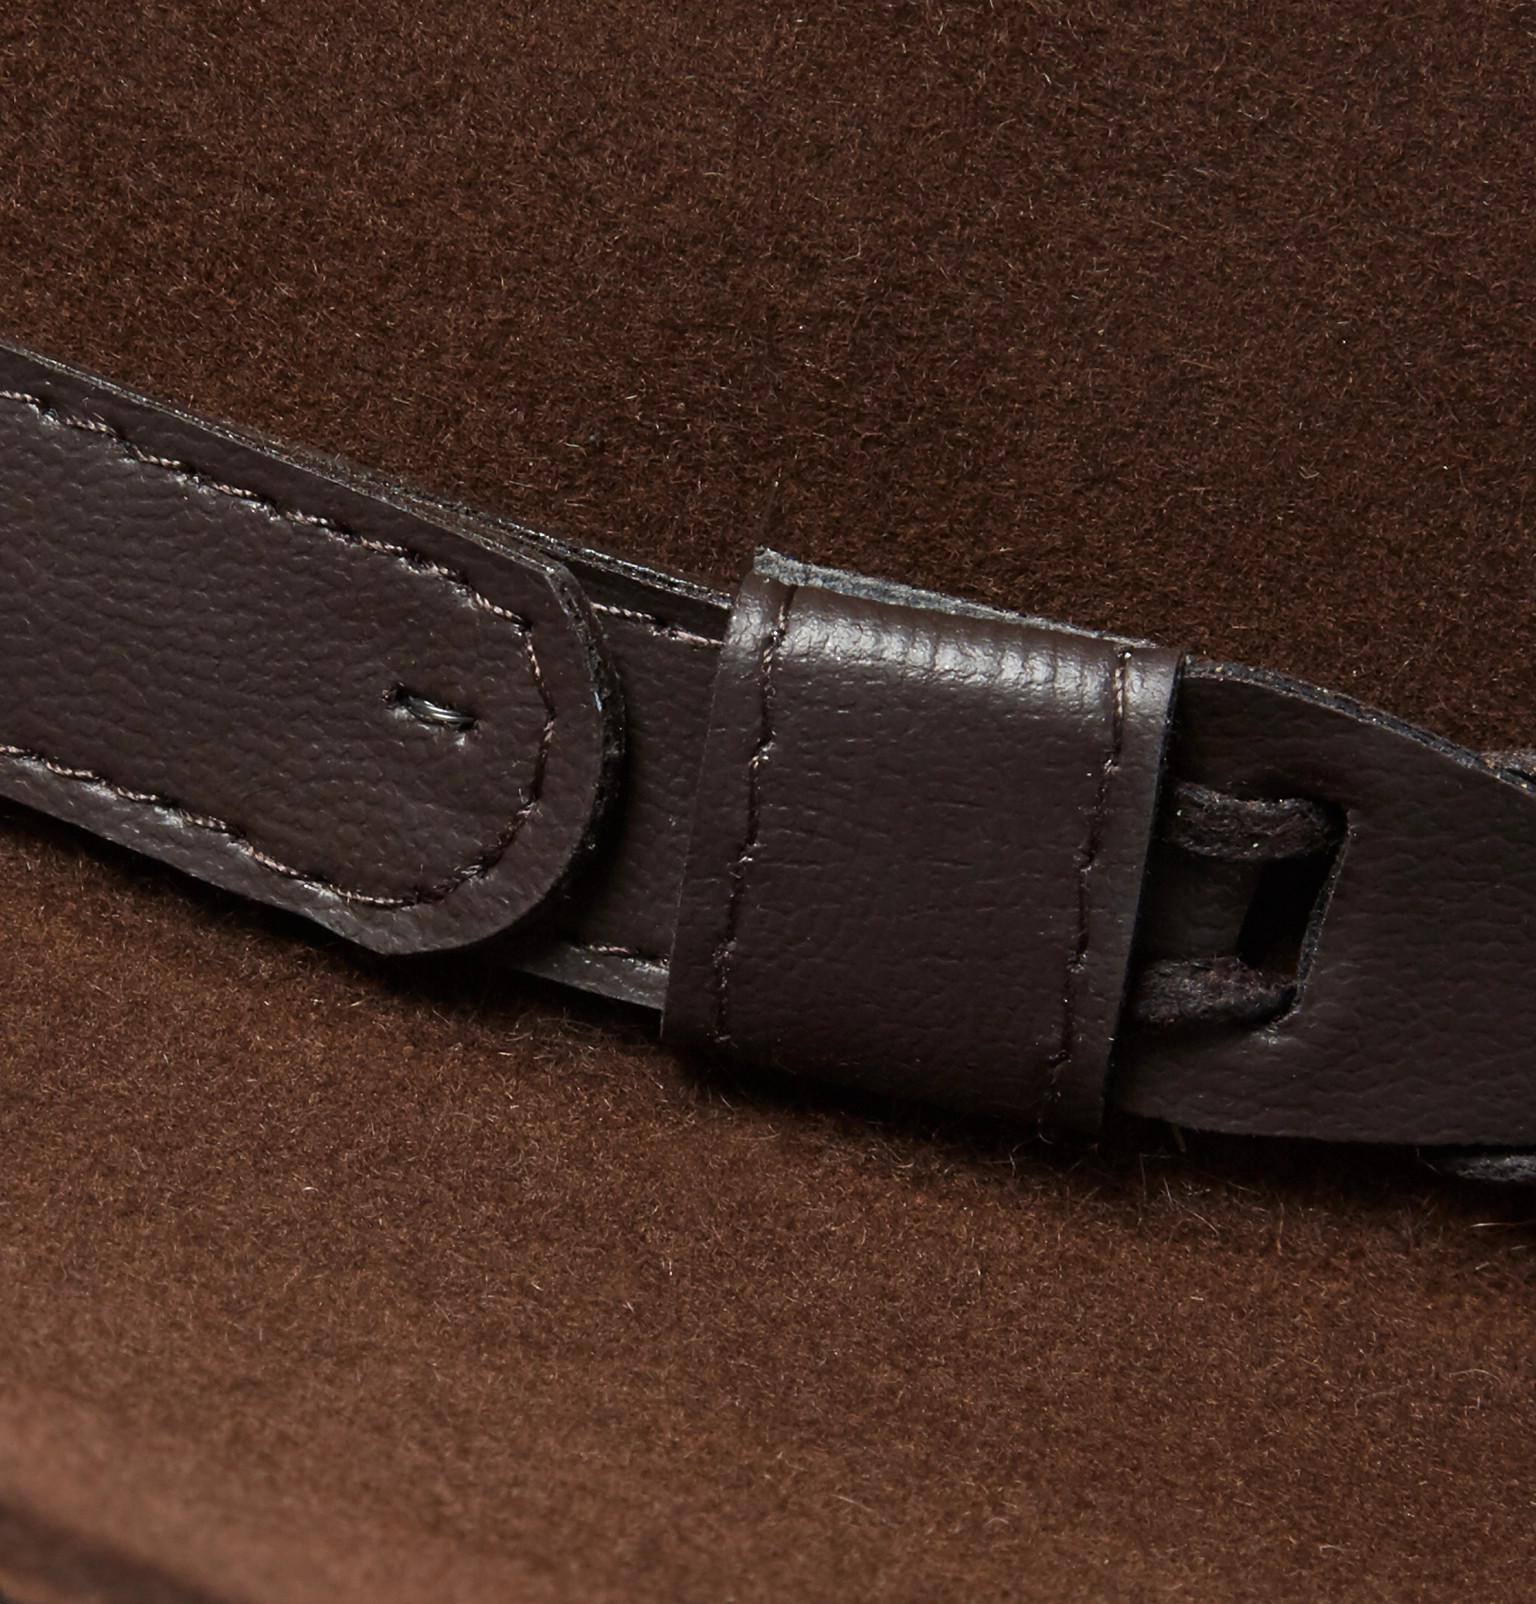 043e8d9b94643 Kingsman + Stetson Jack s Statesman Leather-trimmed Felt Hat in ...